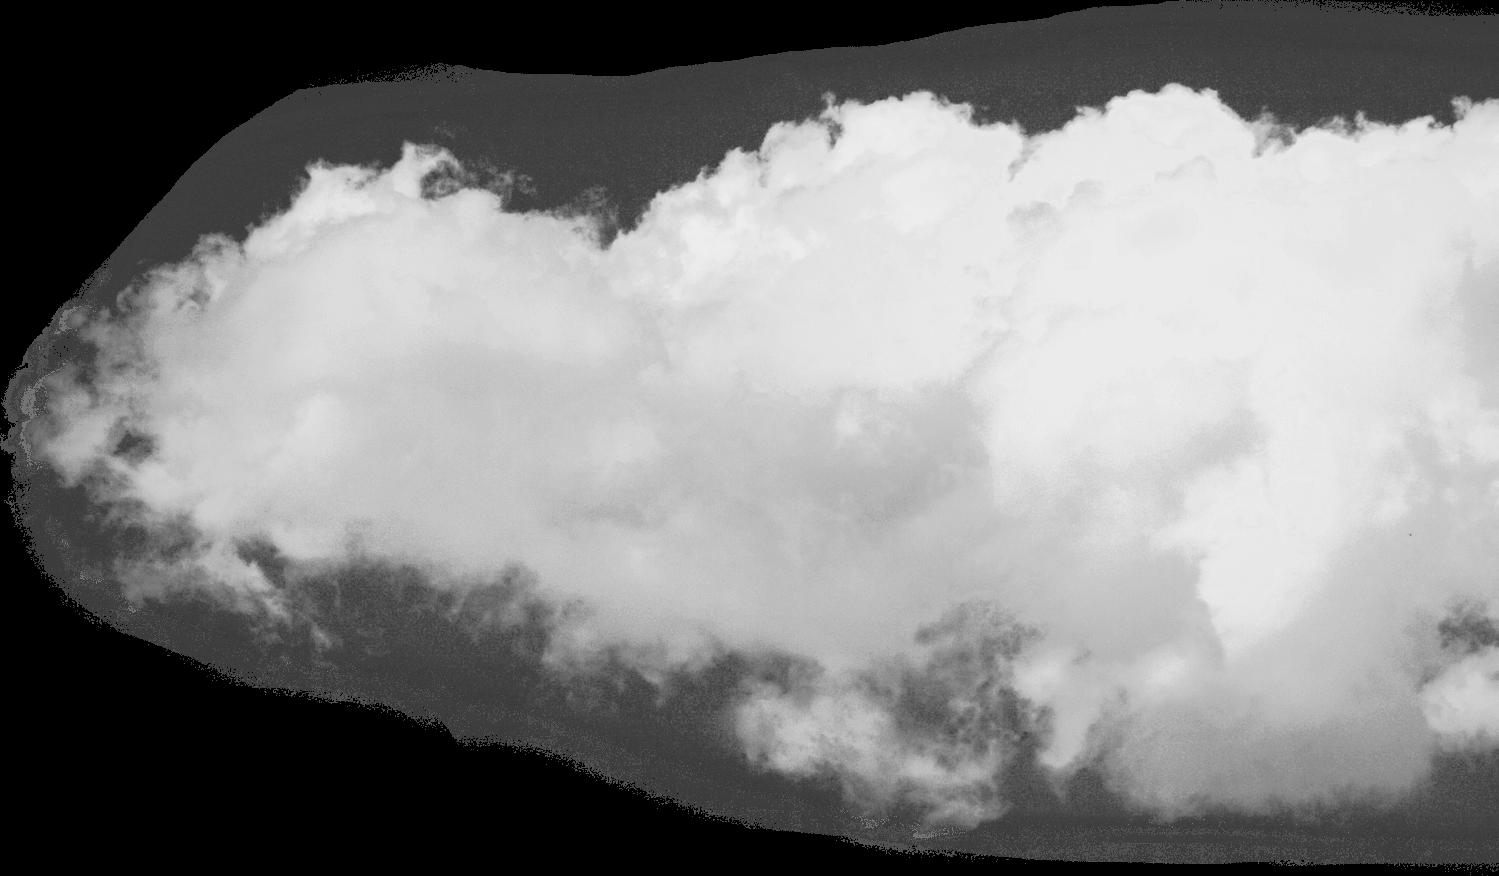 Smoke Png Transparent Image - Smoke Effect, Transparent background PNG HD thumbnail